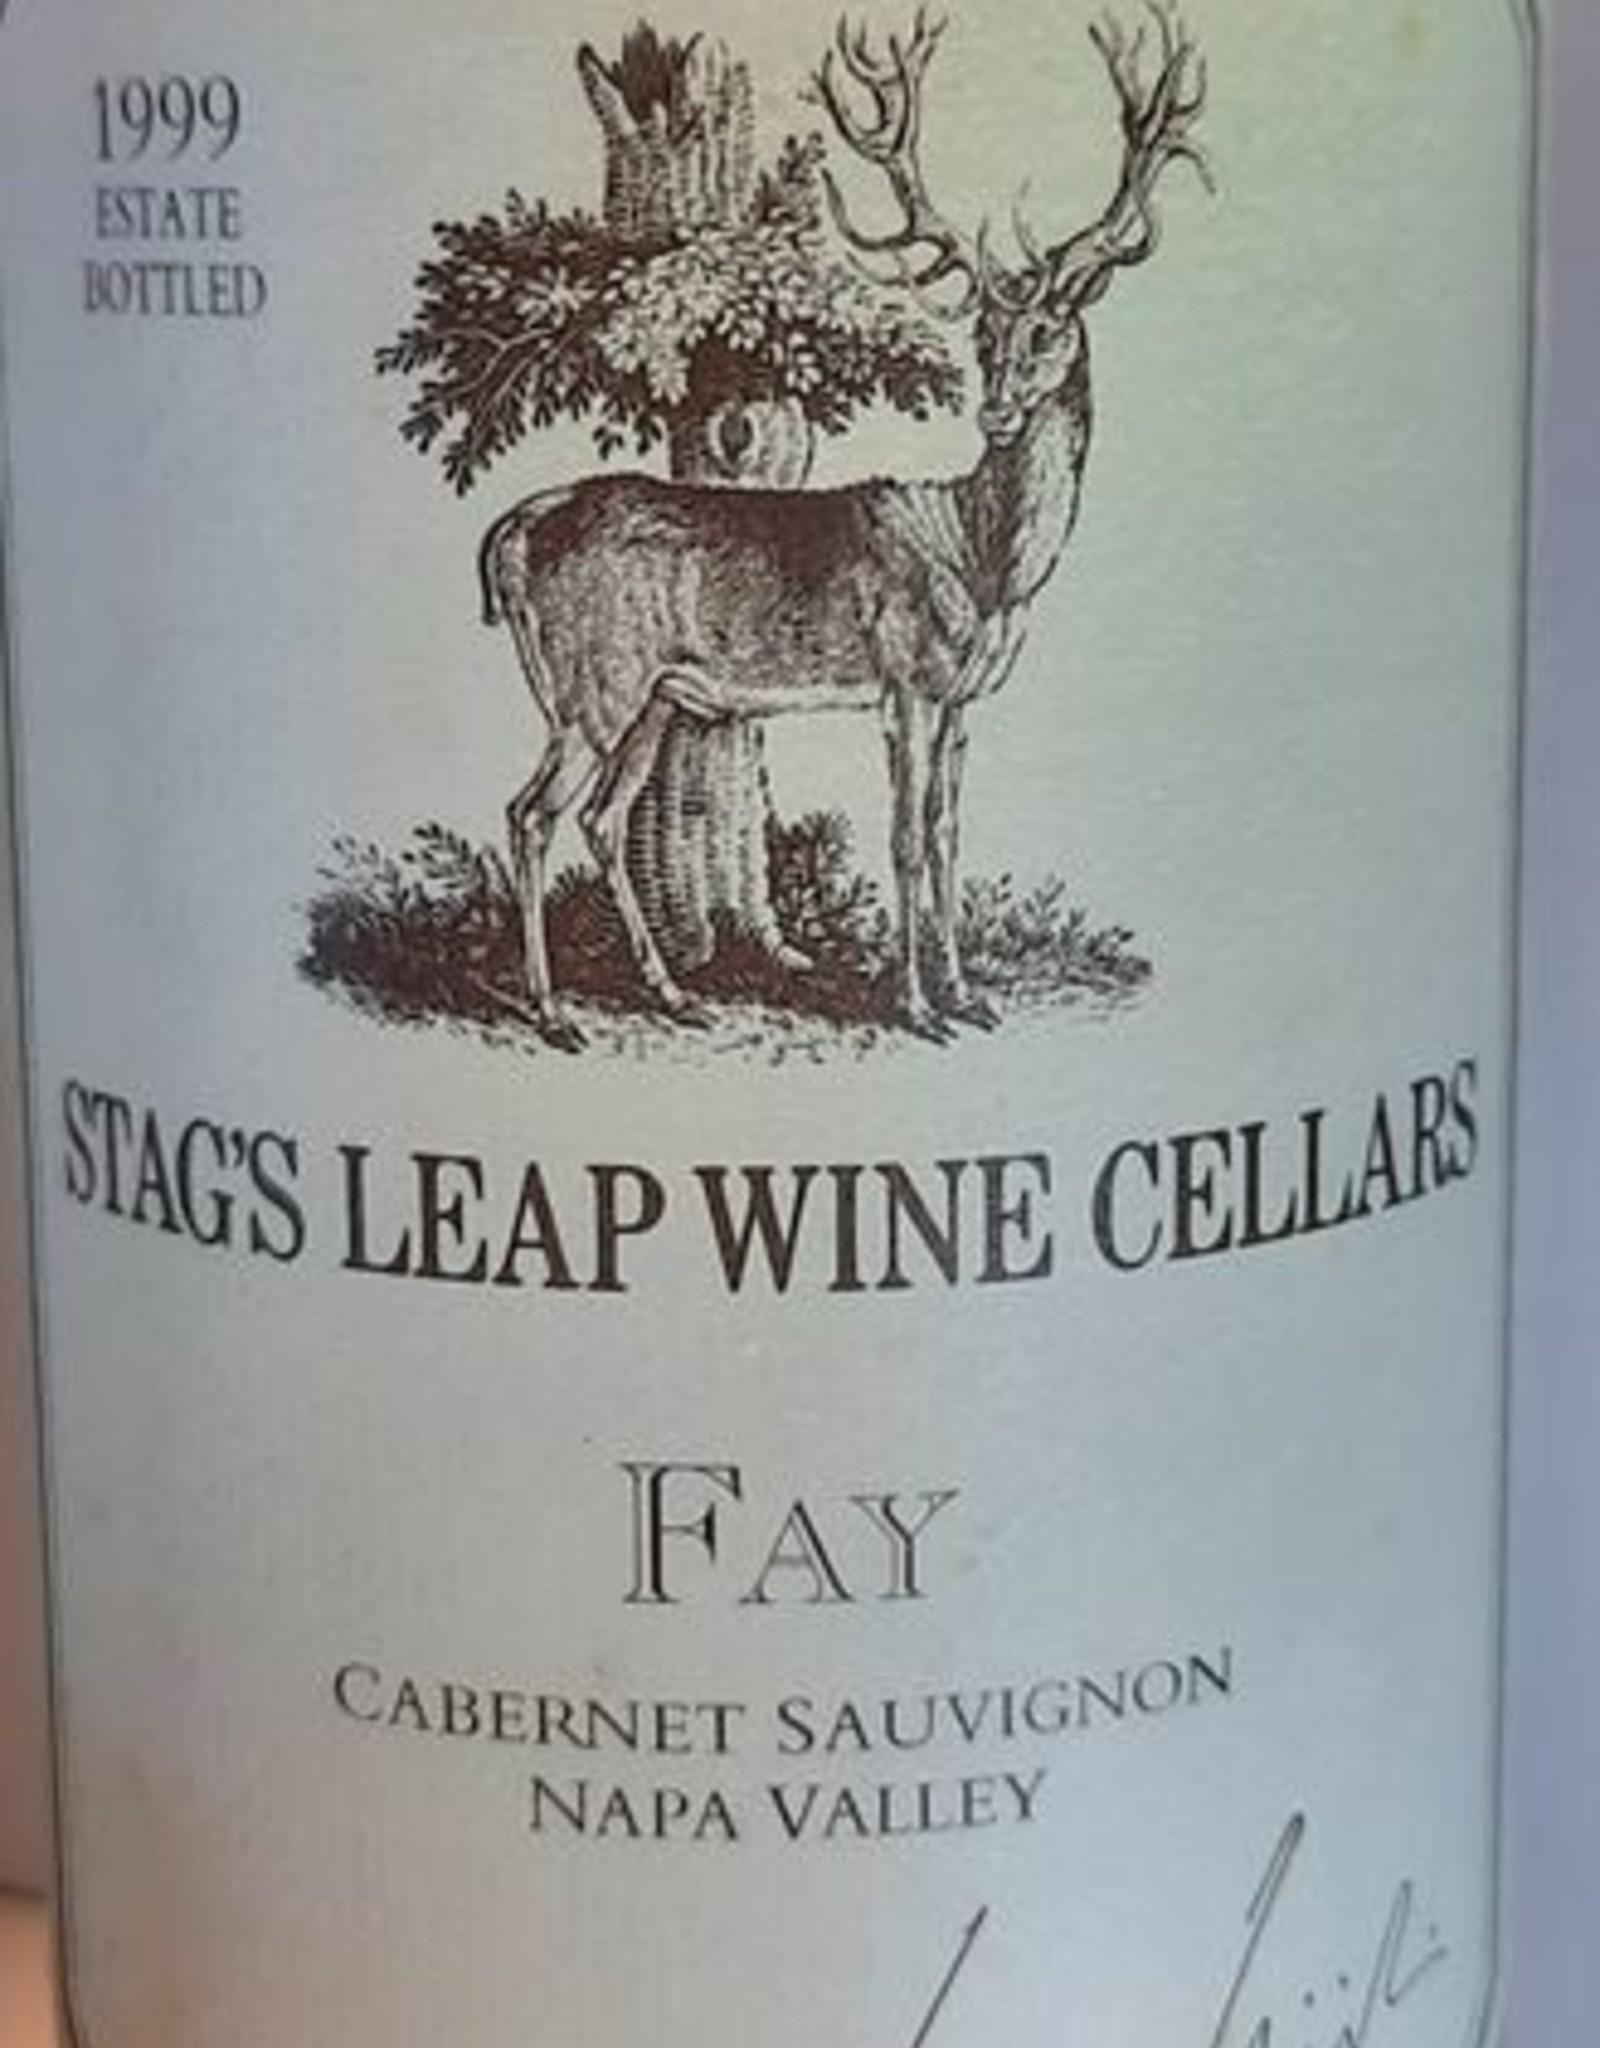 Stags Leap Wine Cellars Fay 1999 Cabernet Sauvignon